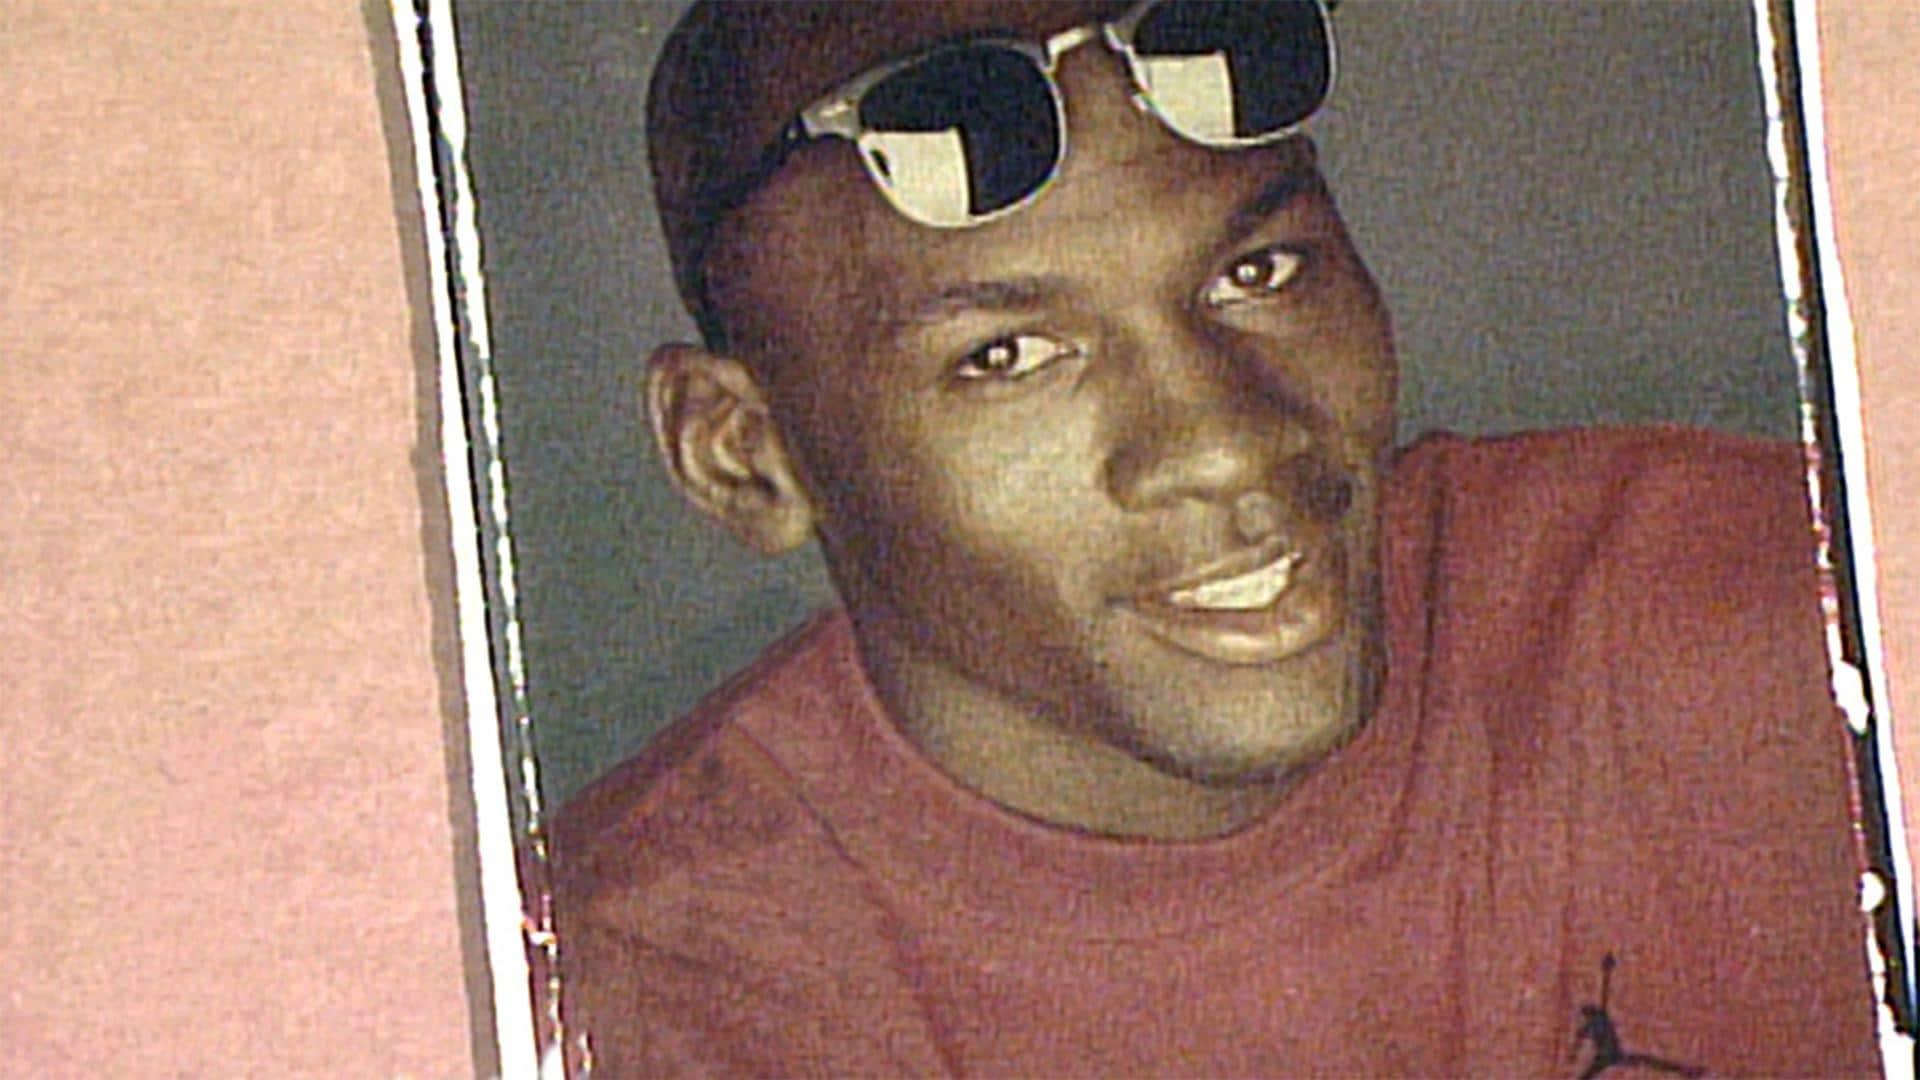 Michael Jordan: September 28, 1991